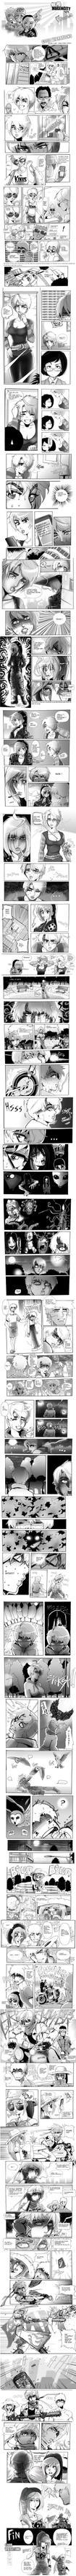 TRANSLATED -MUGEN CITY EPISODE GOOD VIBRATIONS by MaKuZoKu